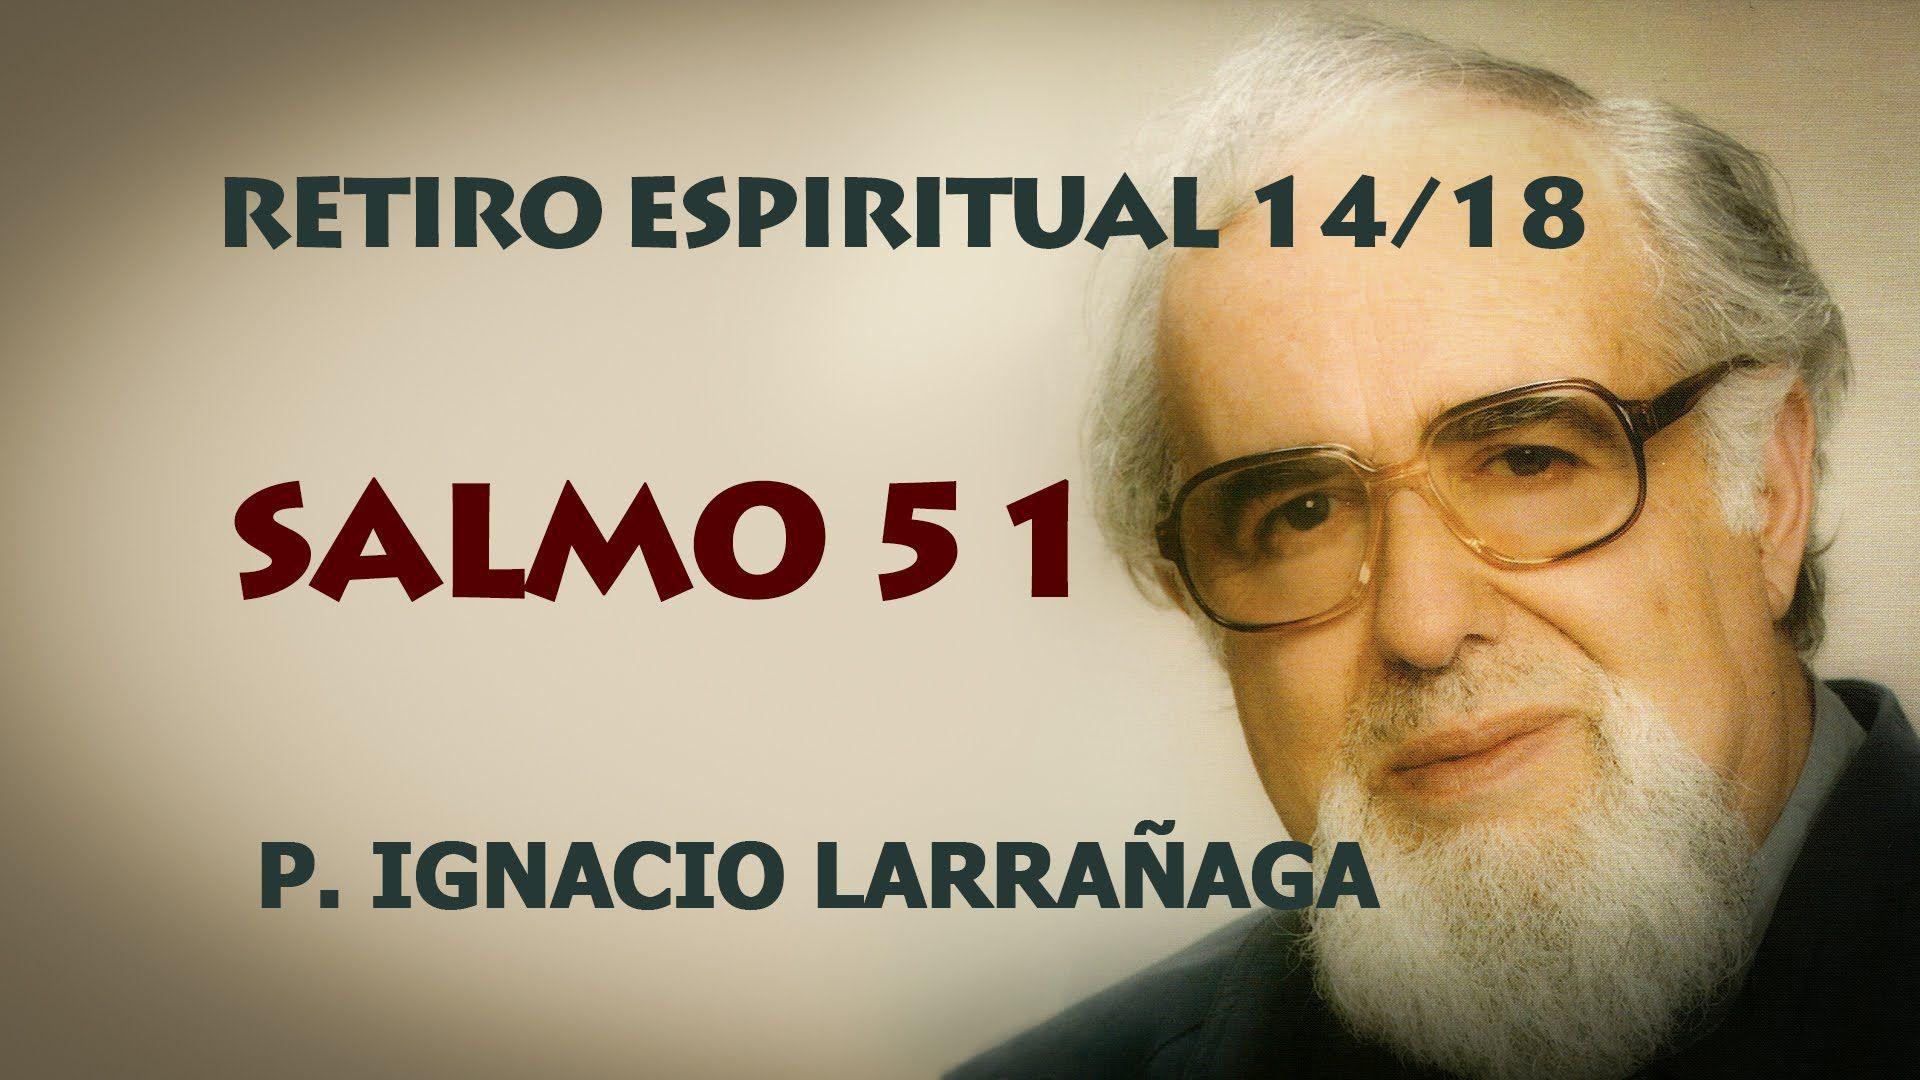 Retiro Espiritual 14/18 - Salmo 51 - Padre Ignacio Larrañaga